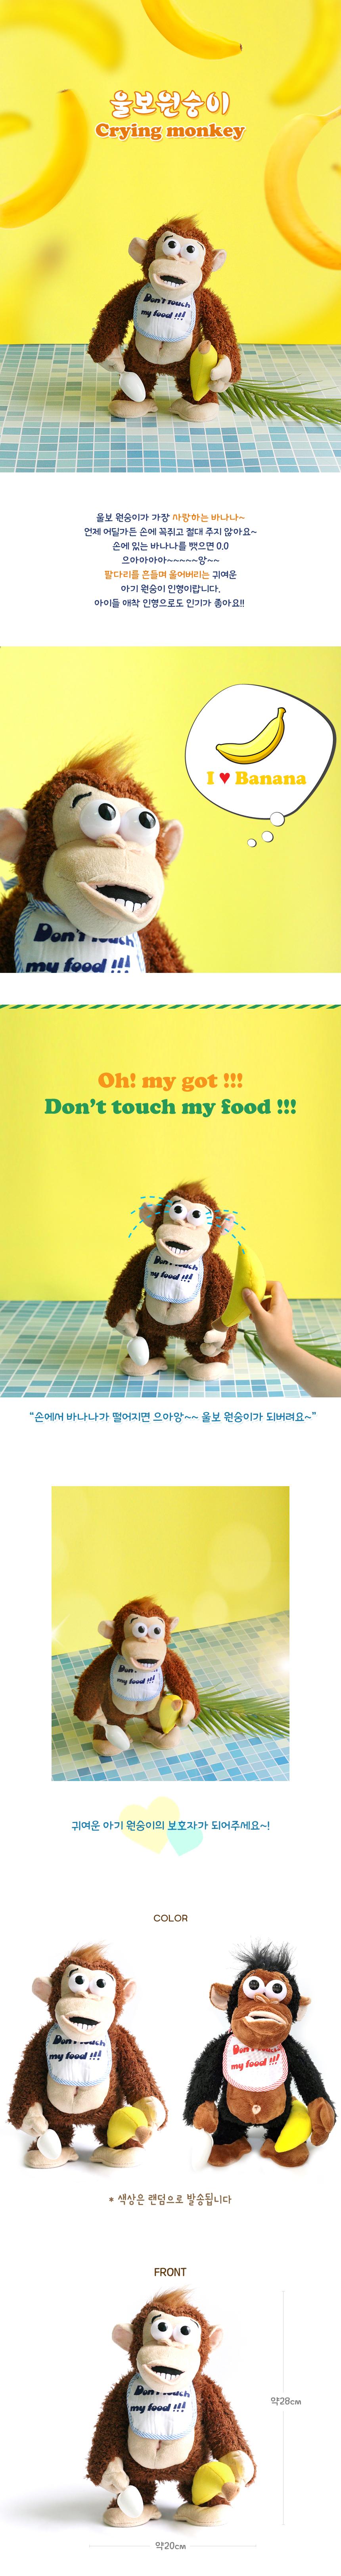 crying_monkey1.jpg